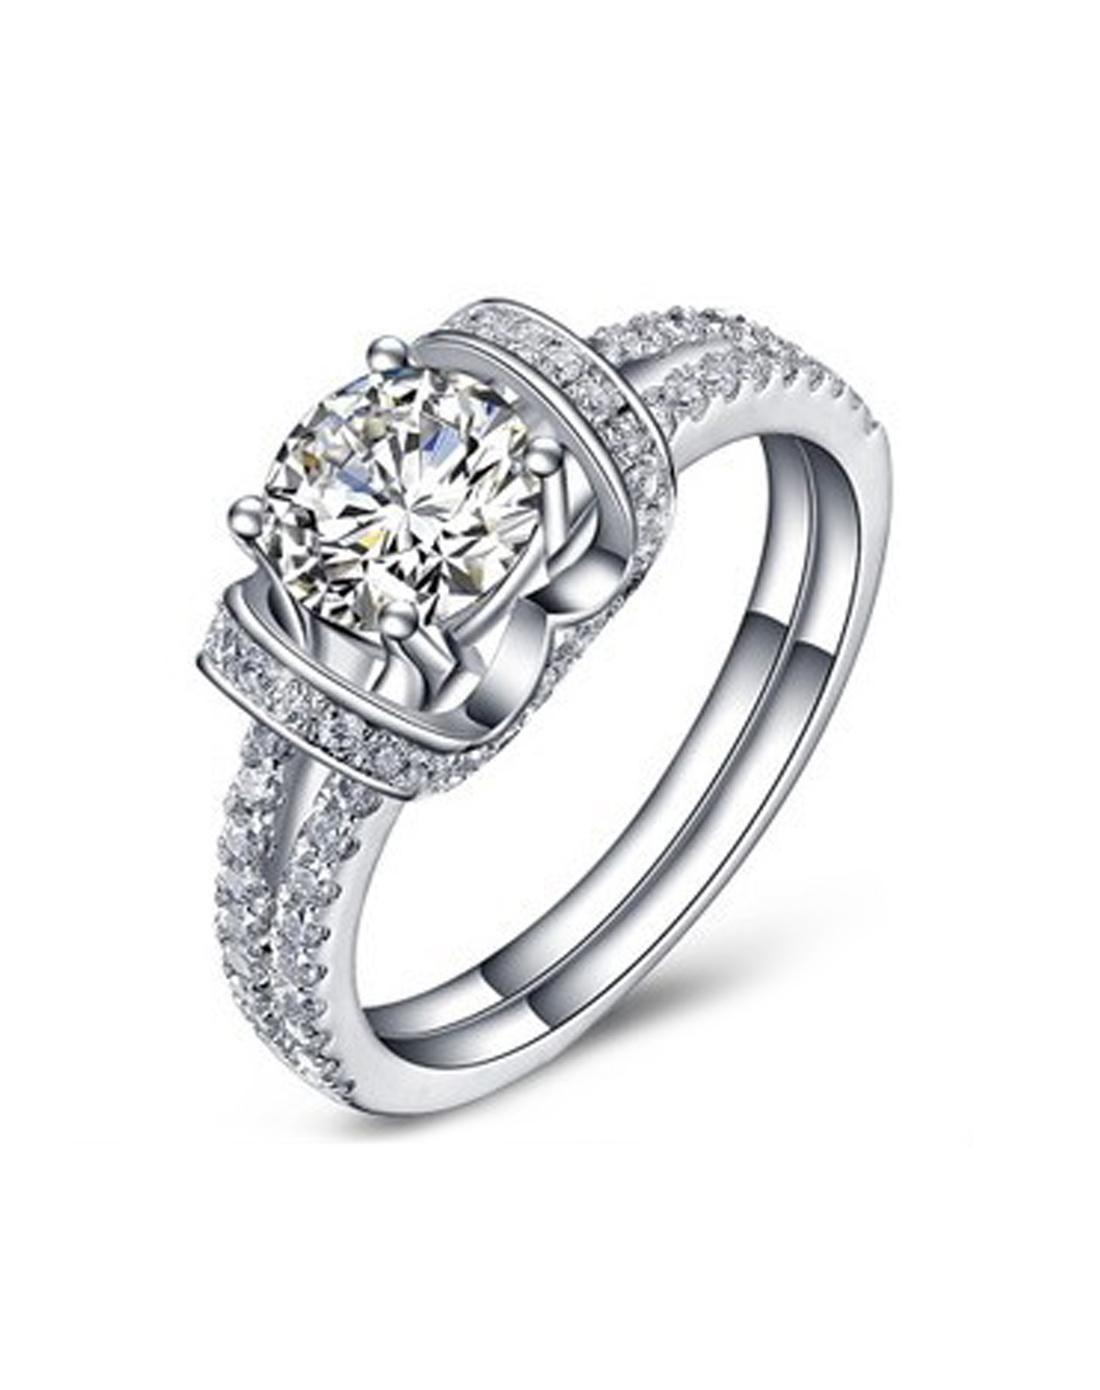 Adorewe Vipme Rings Siruiman 1ct Sona Diamond Sterling Silver Wedding Ring: The Flash Inspired Wedding Ring At Websimilar.org